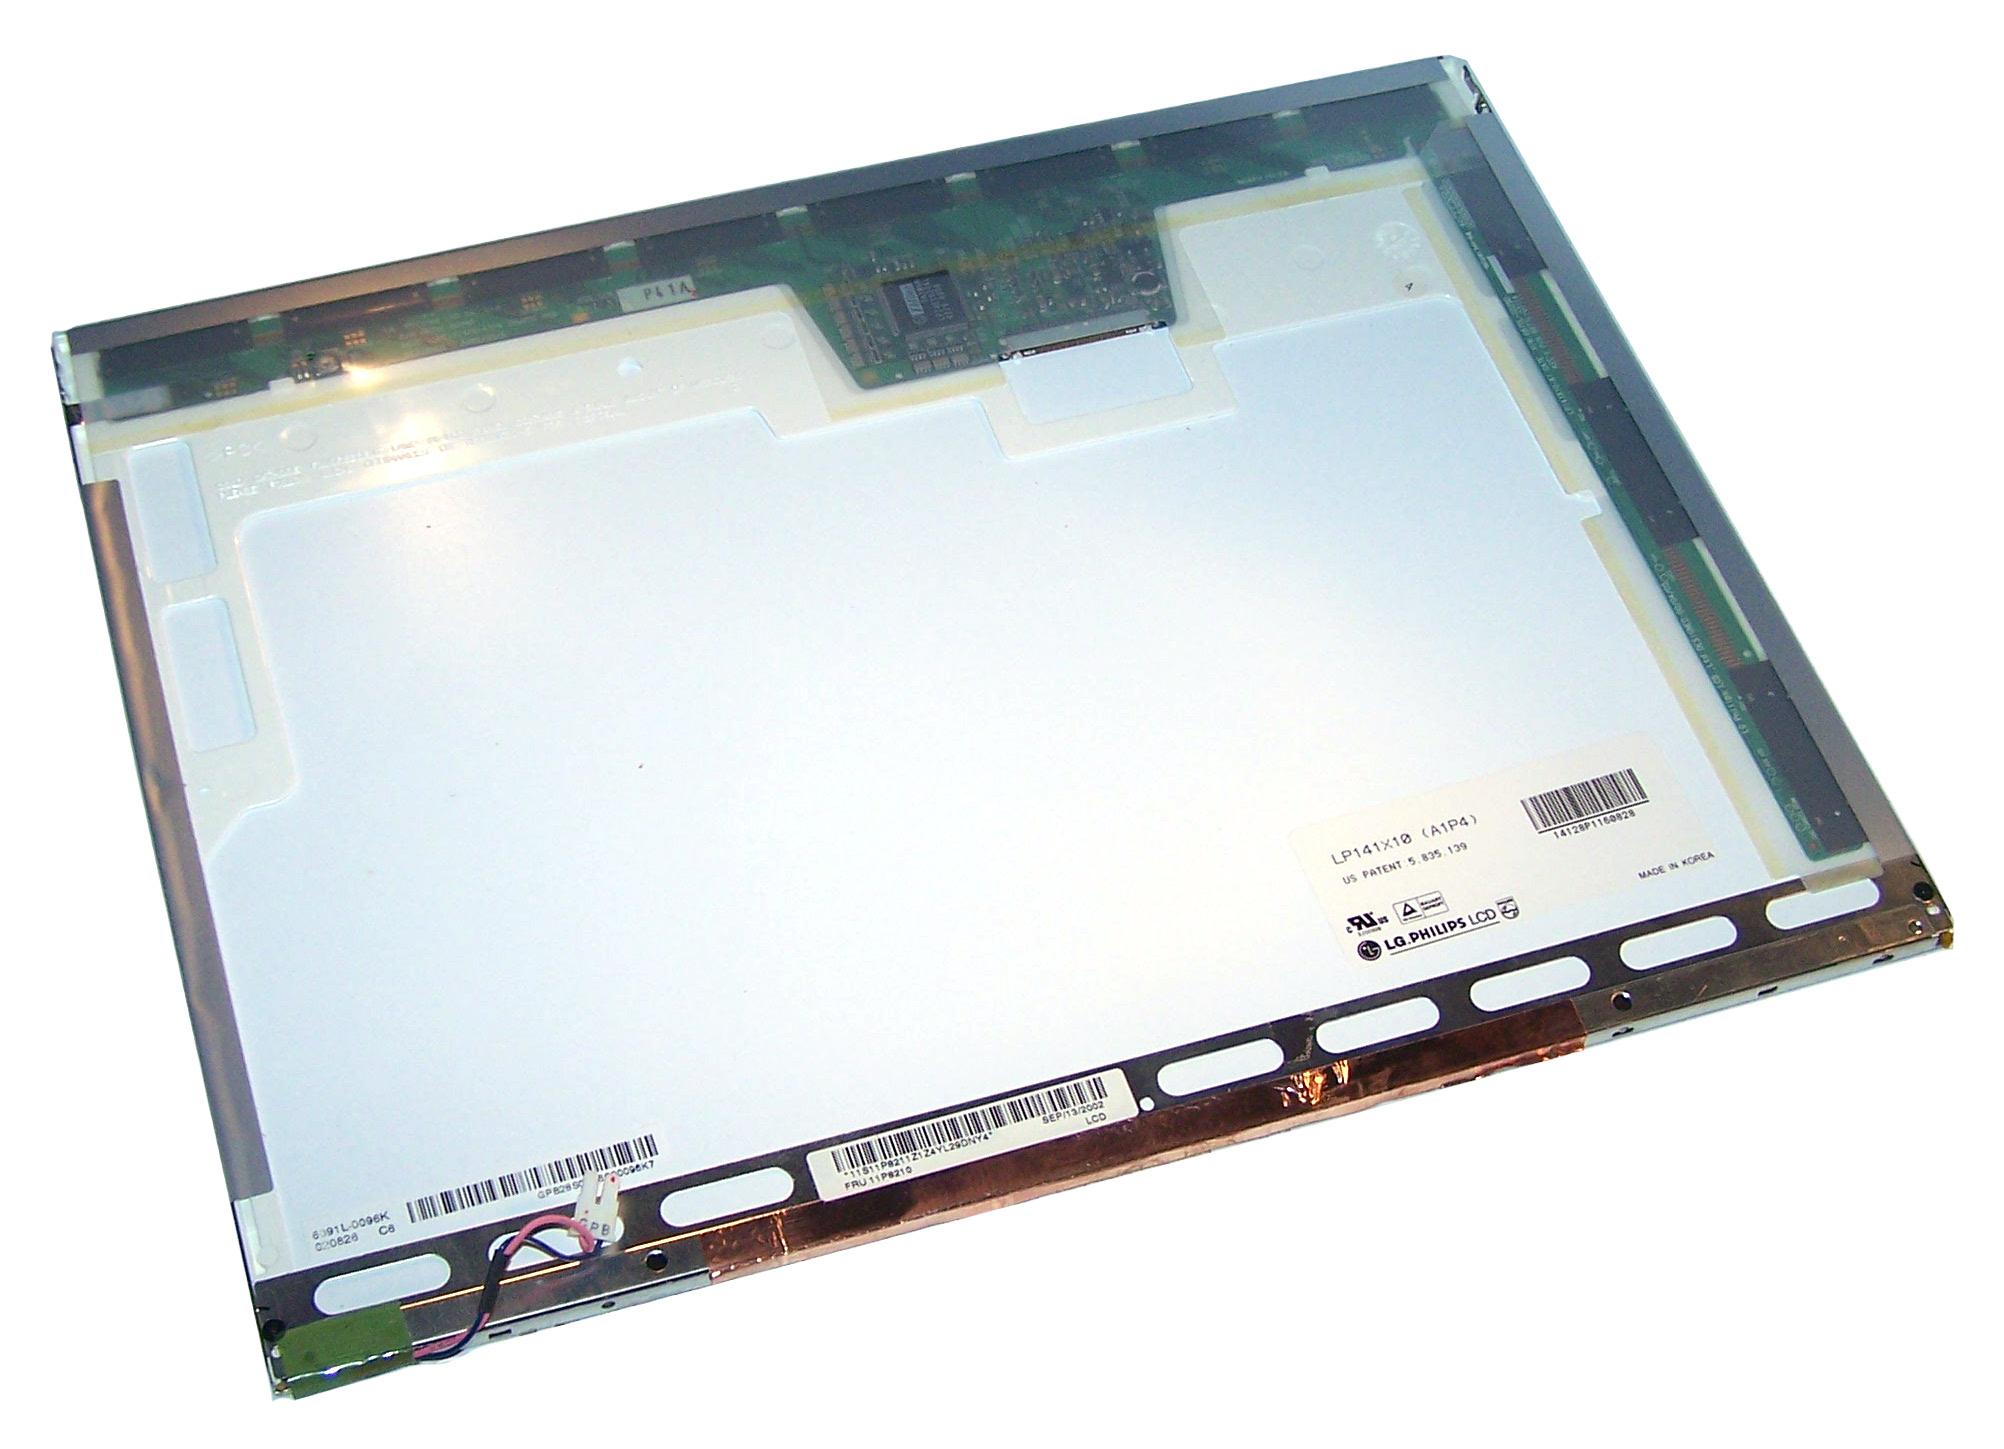 Lg Philips 14.1 Xga Lcd Display Lp141X10 (A1)(C5) Lp141X10-A1C5